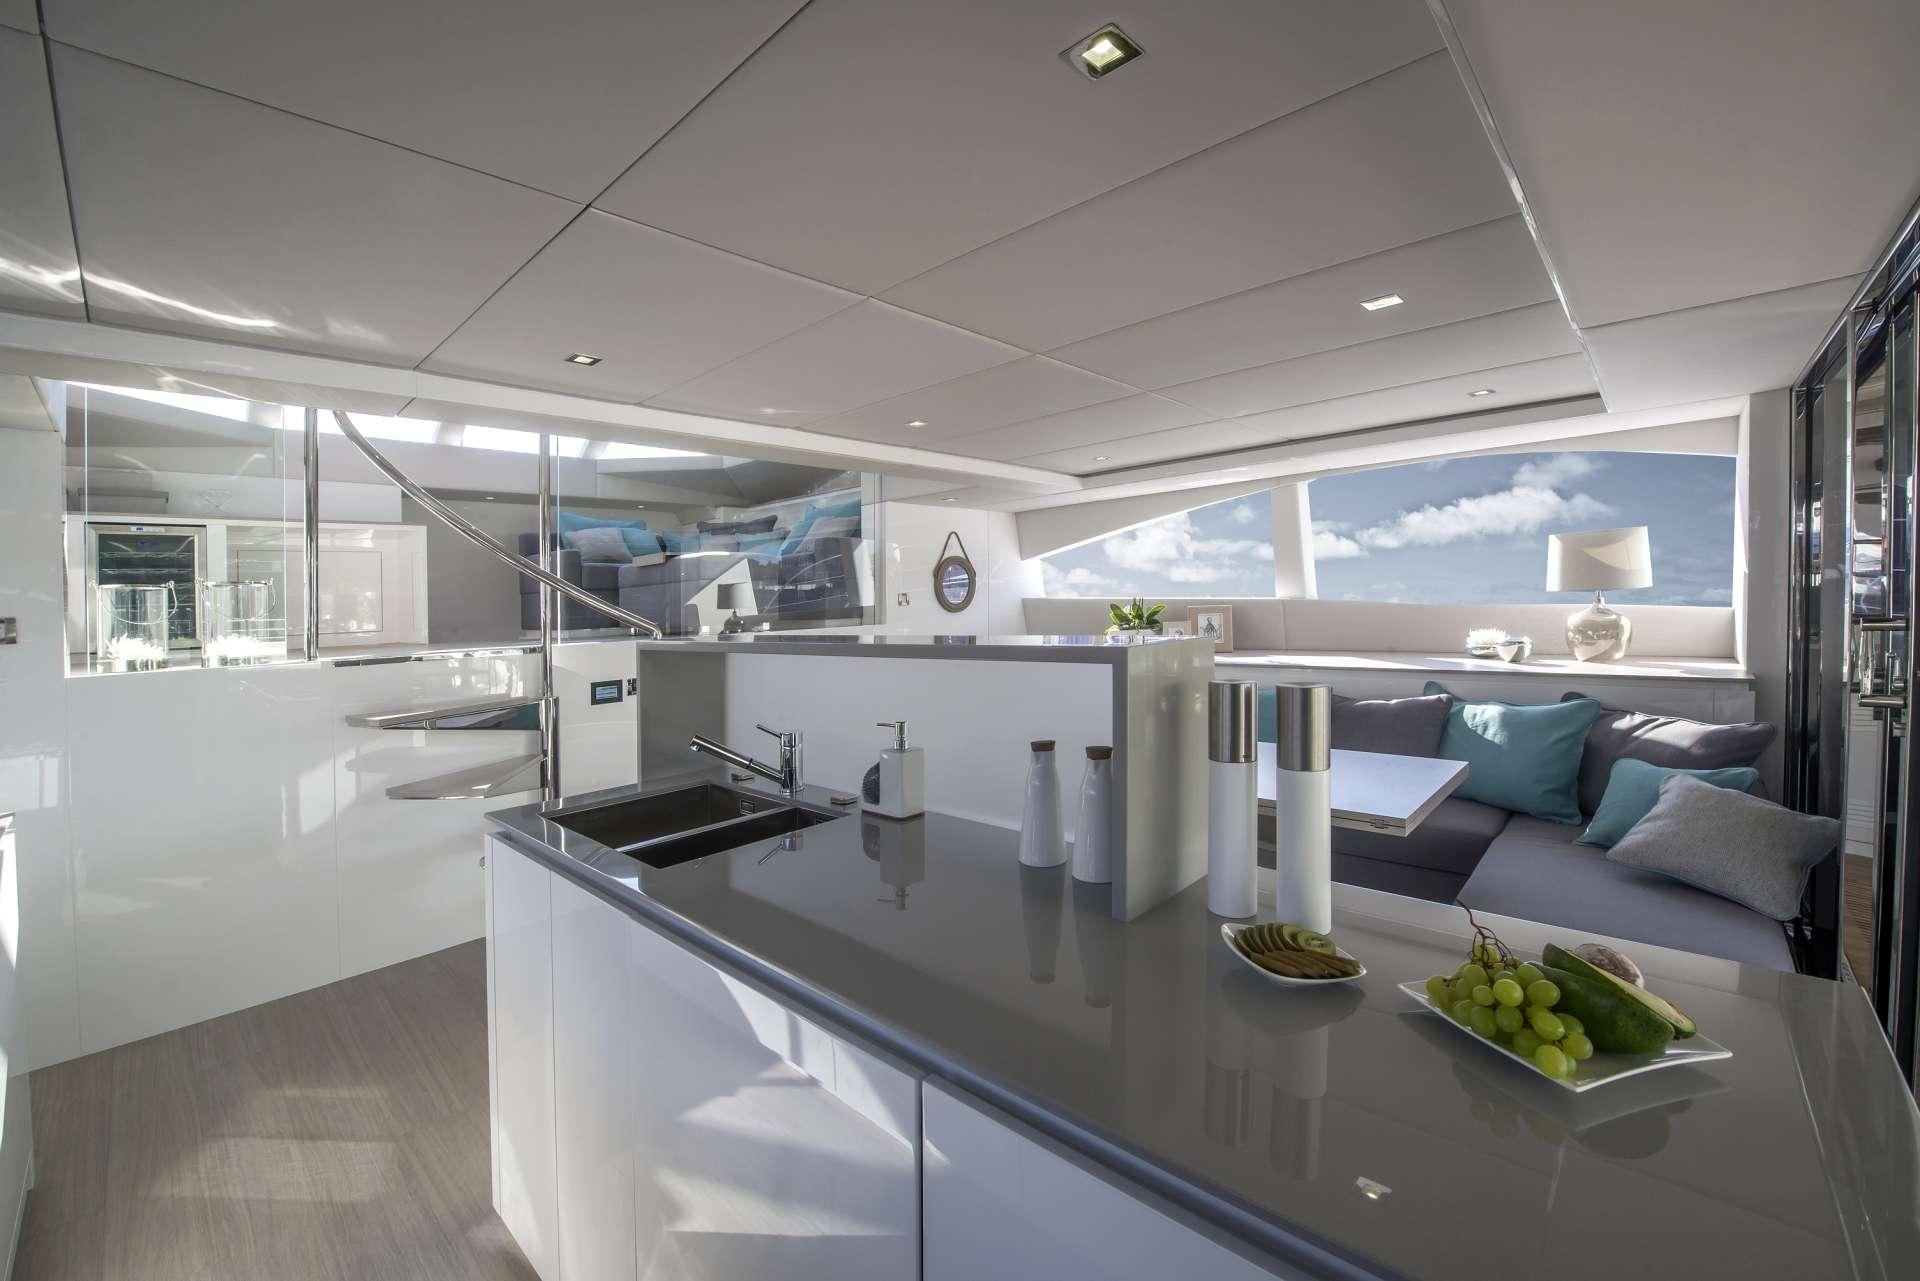 Cat Yacht 'Cat', 6 PAX, 2 Crew, 70.00 Ft, 21.00 Meters, Built 2016, Sunreef Yachts, Refit Year